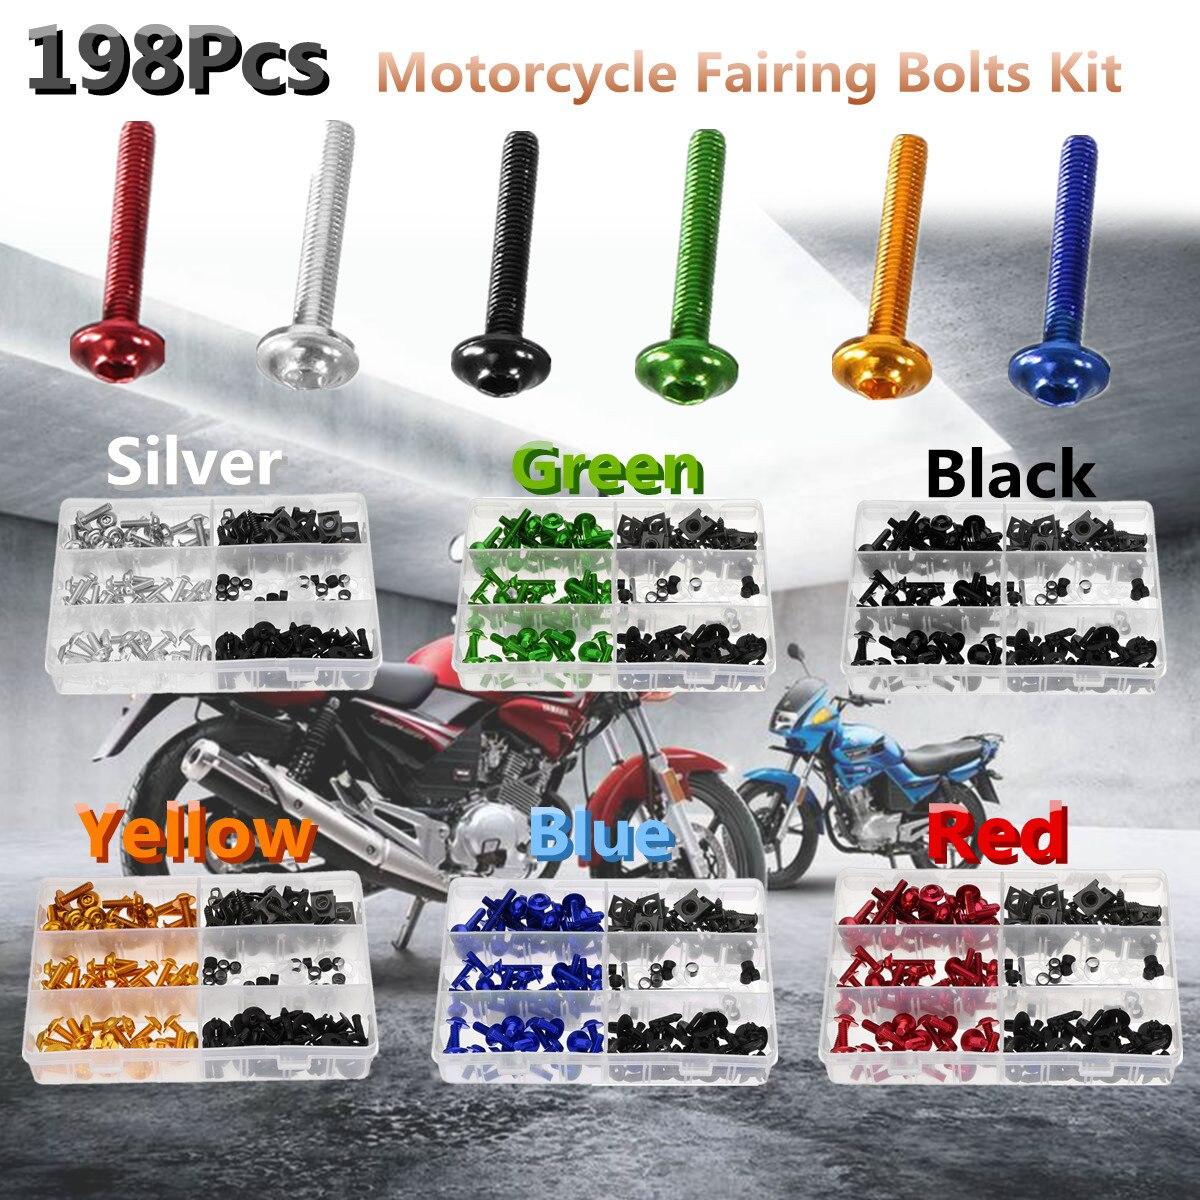 купить 198pcs Universal Motorcycle Fairing Spring Screws Bolts Nuts Kit Fastener Clips Sportbike for Honda/Yamaha/Kawasaki/Suzuki по цене 1263.42 рублей